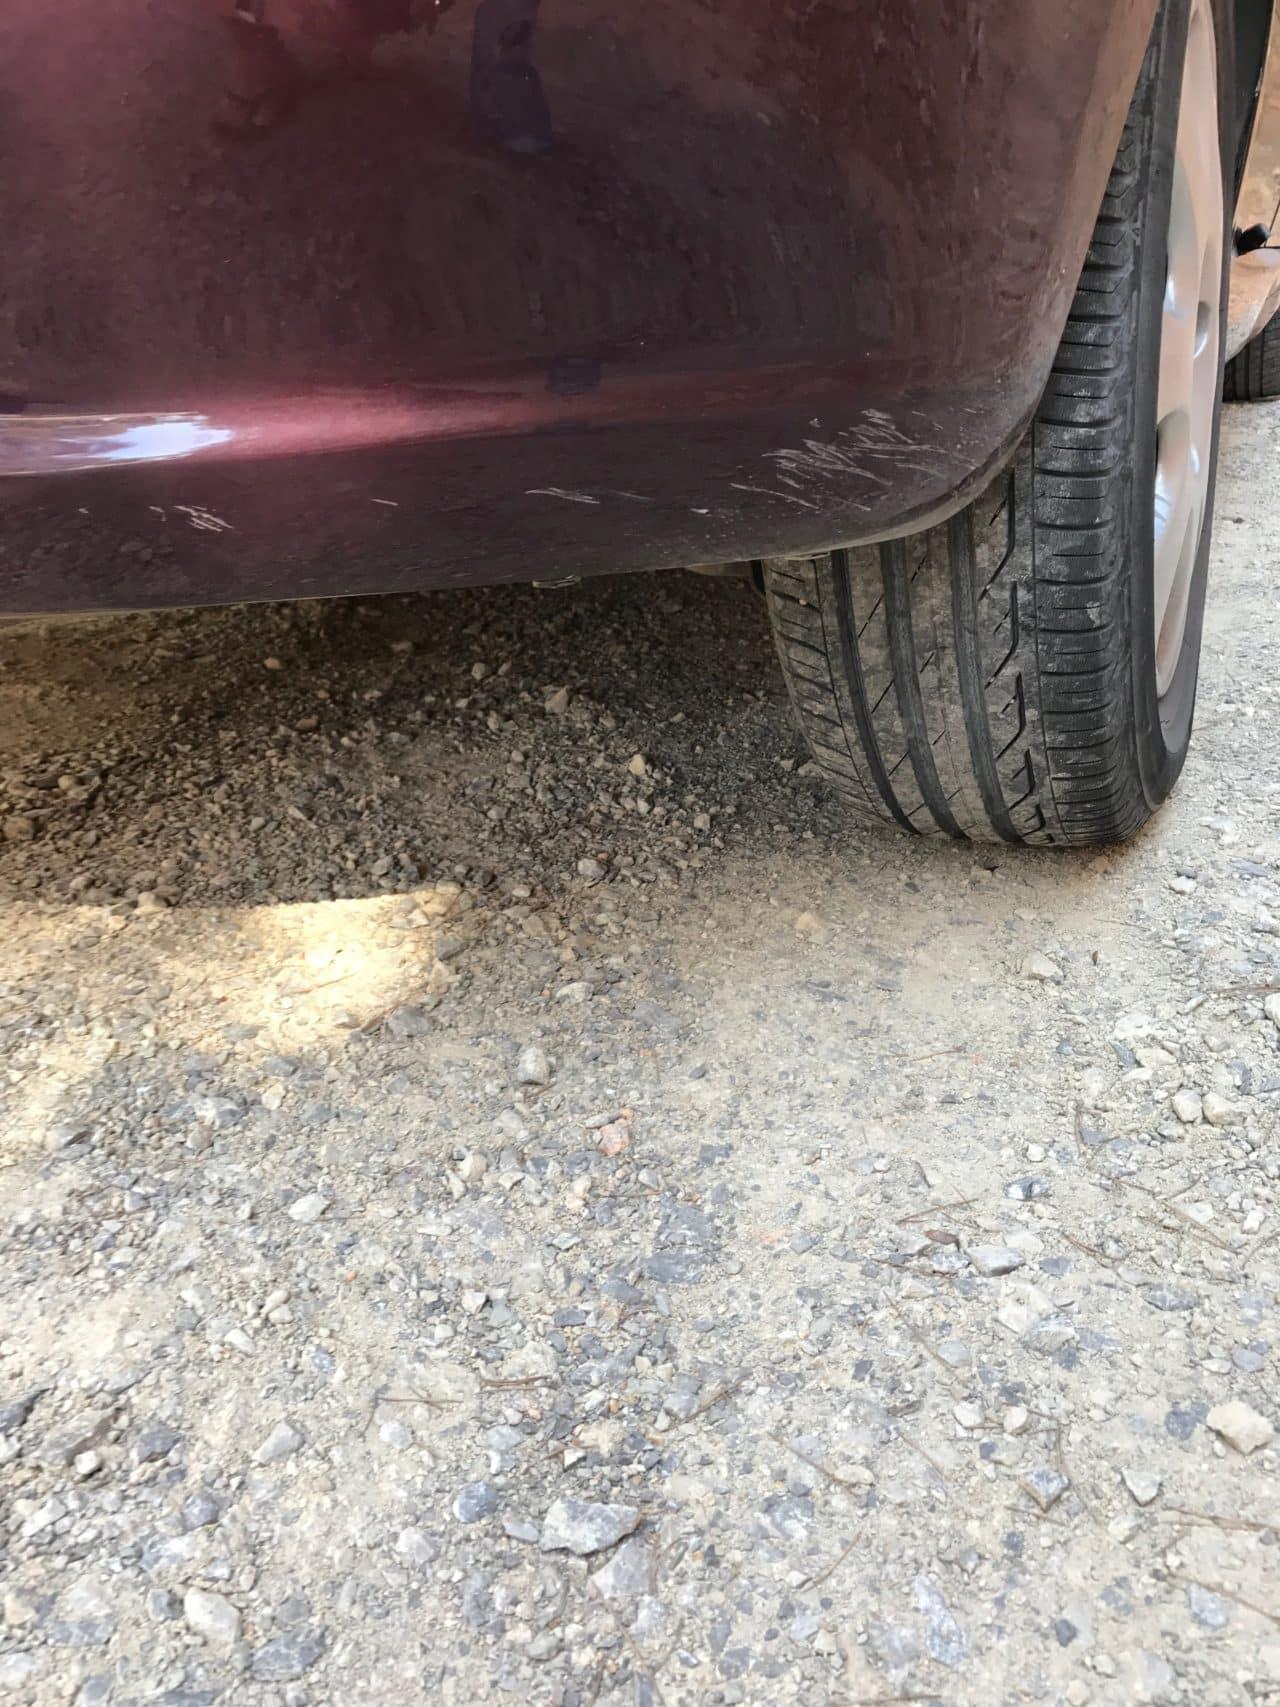 Dusty Car With Scrape Damage In The Rear